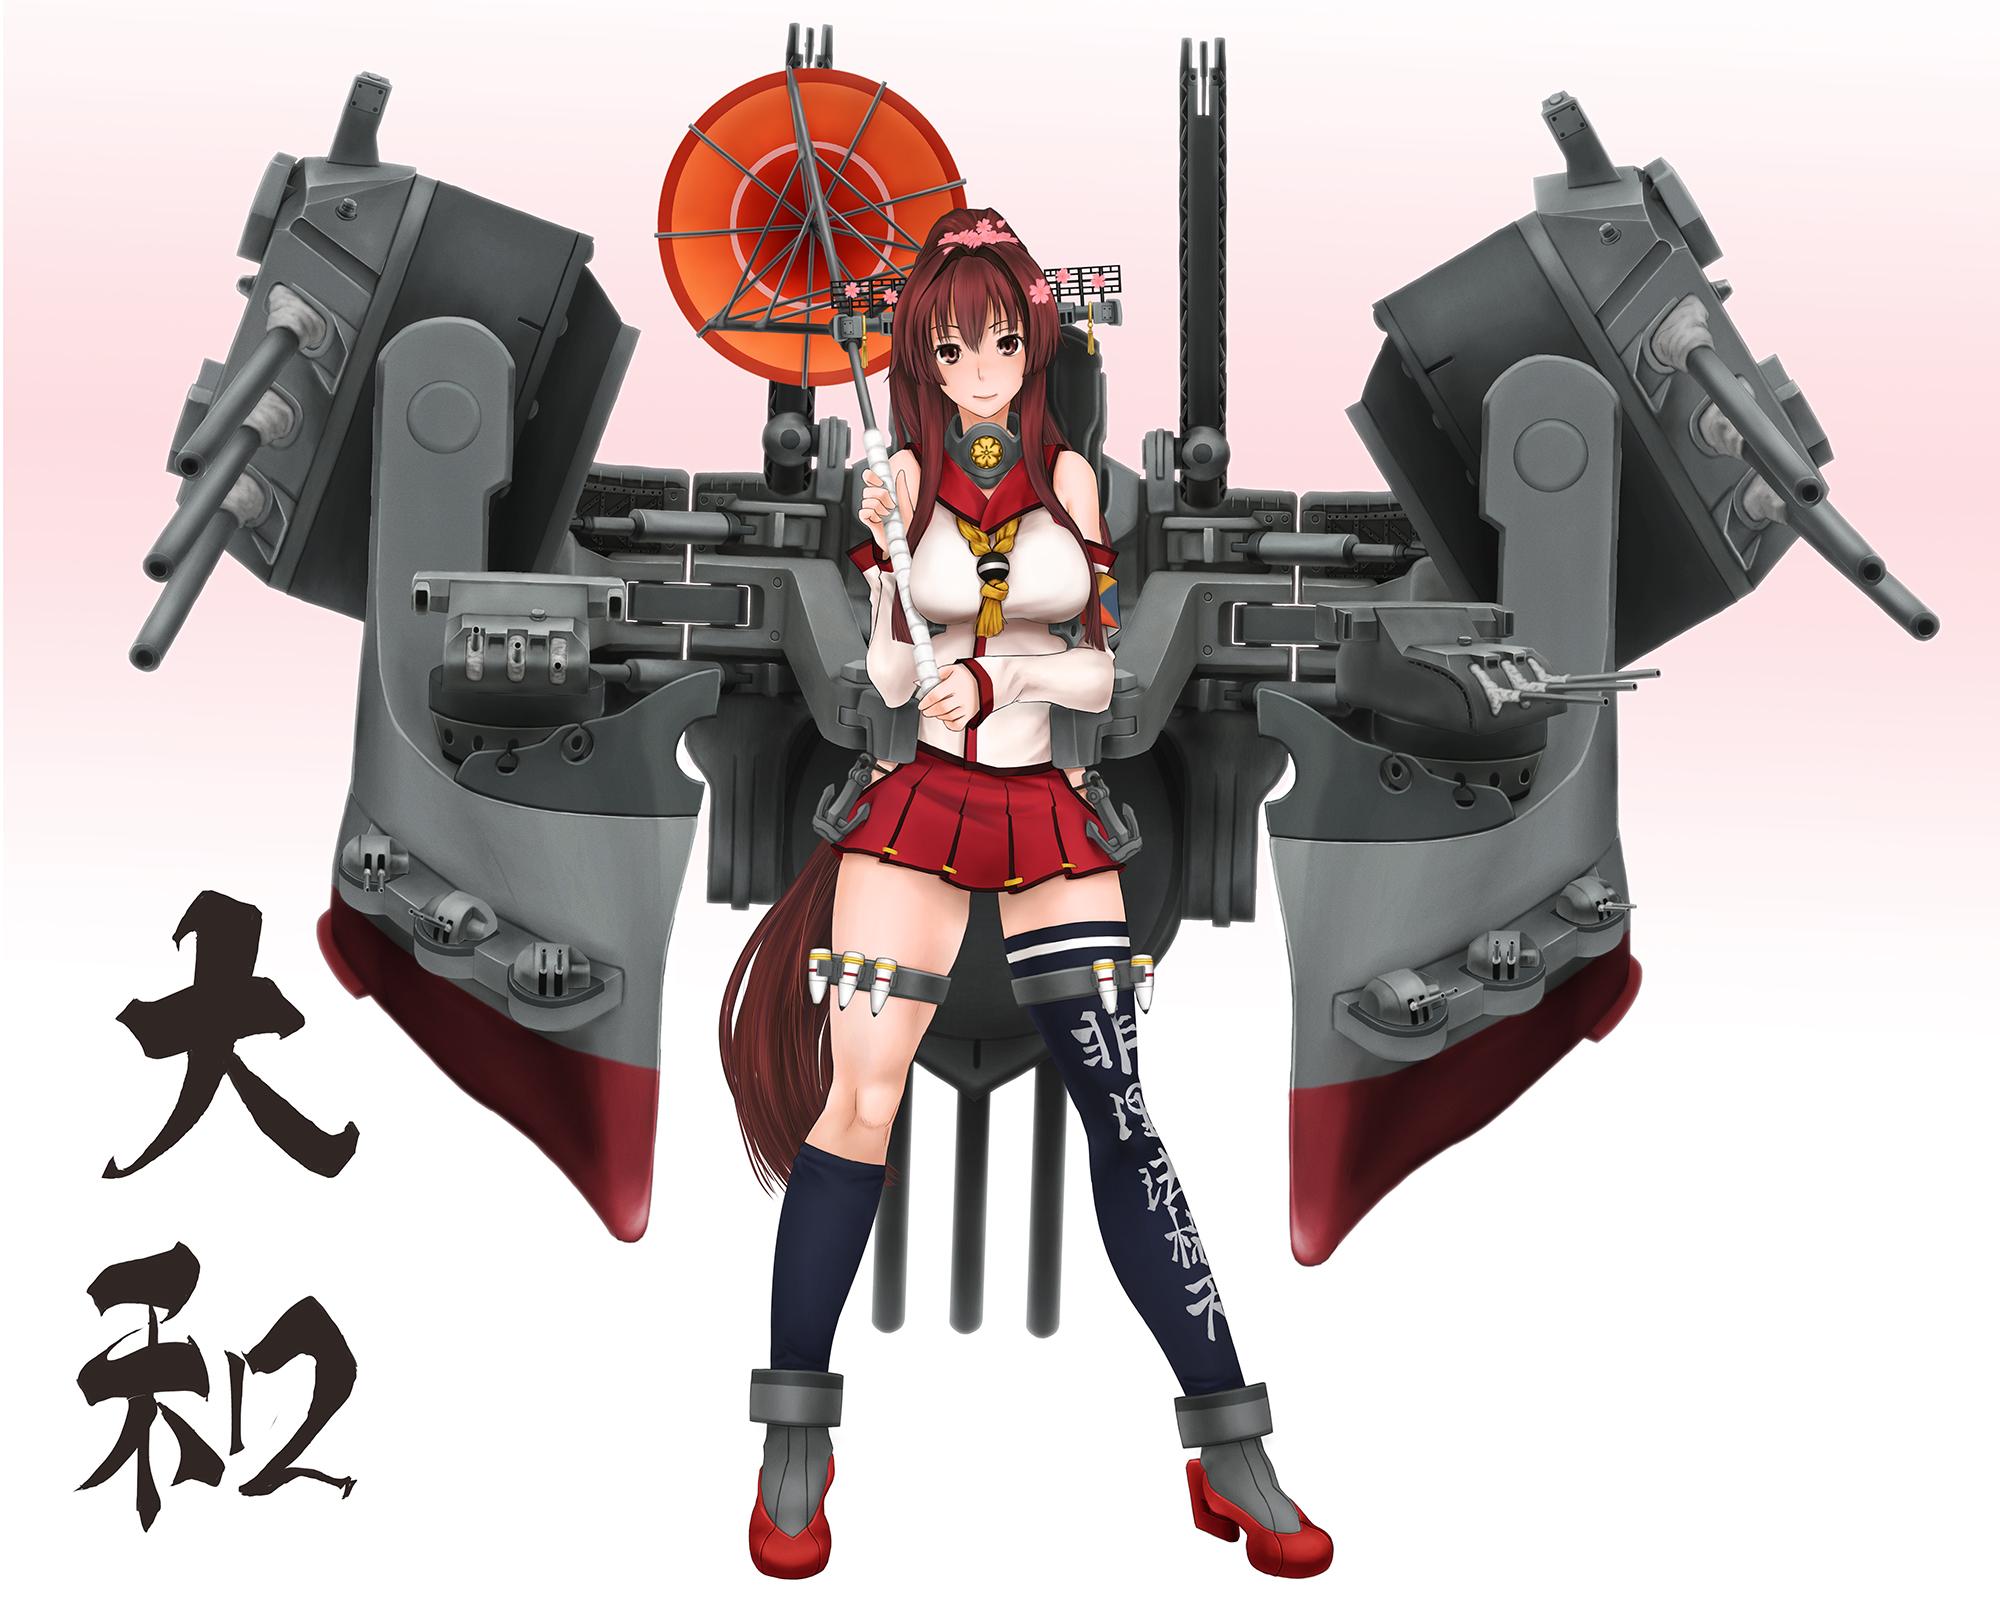 anime_wallpaper_Kantai_Collection_yamato_Scharfschutze-818816.jpeg